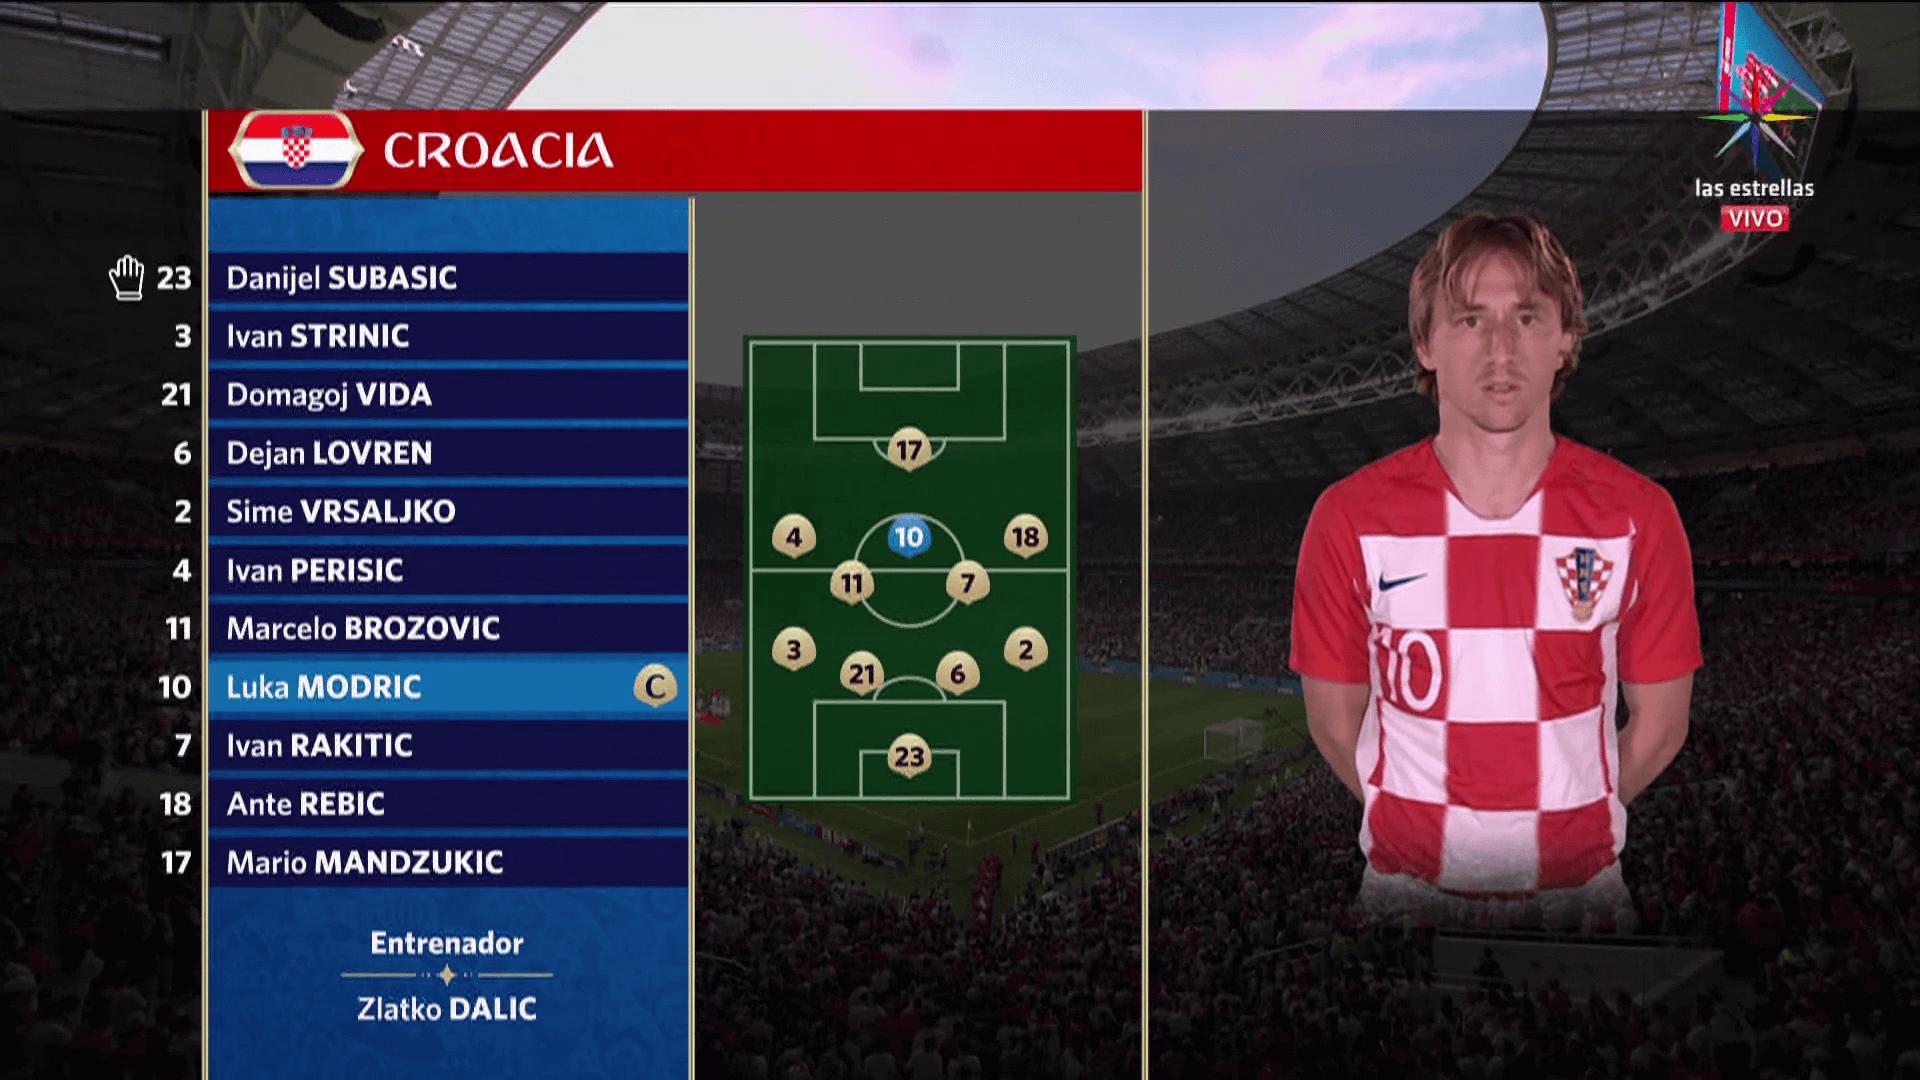 croacia vs inglaterra imagenes